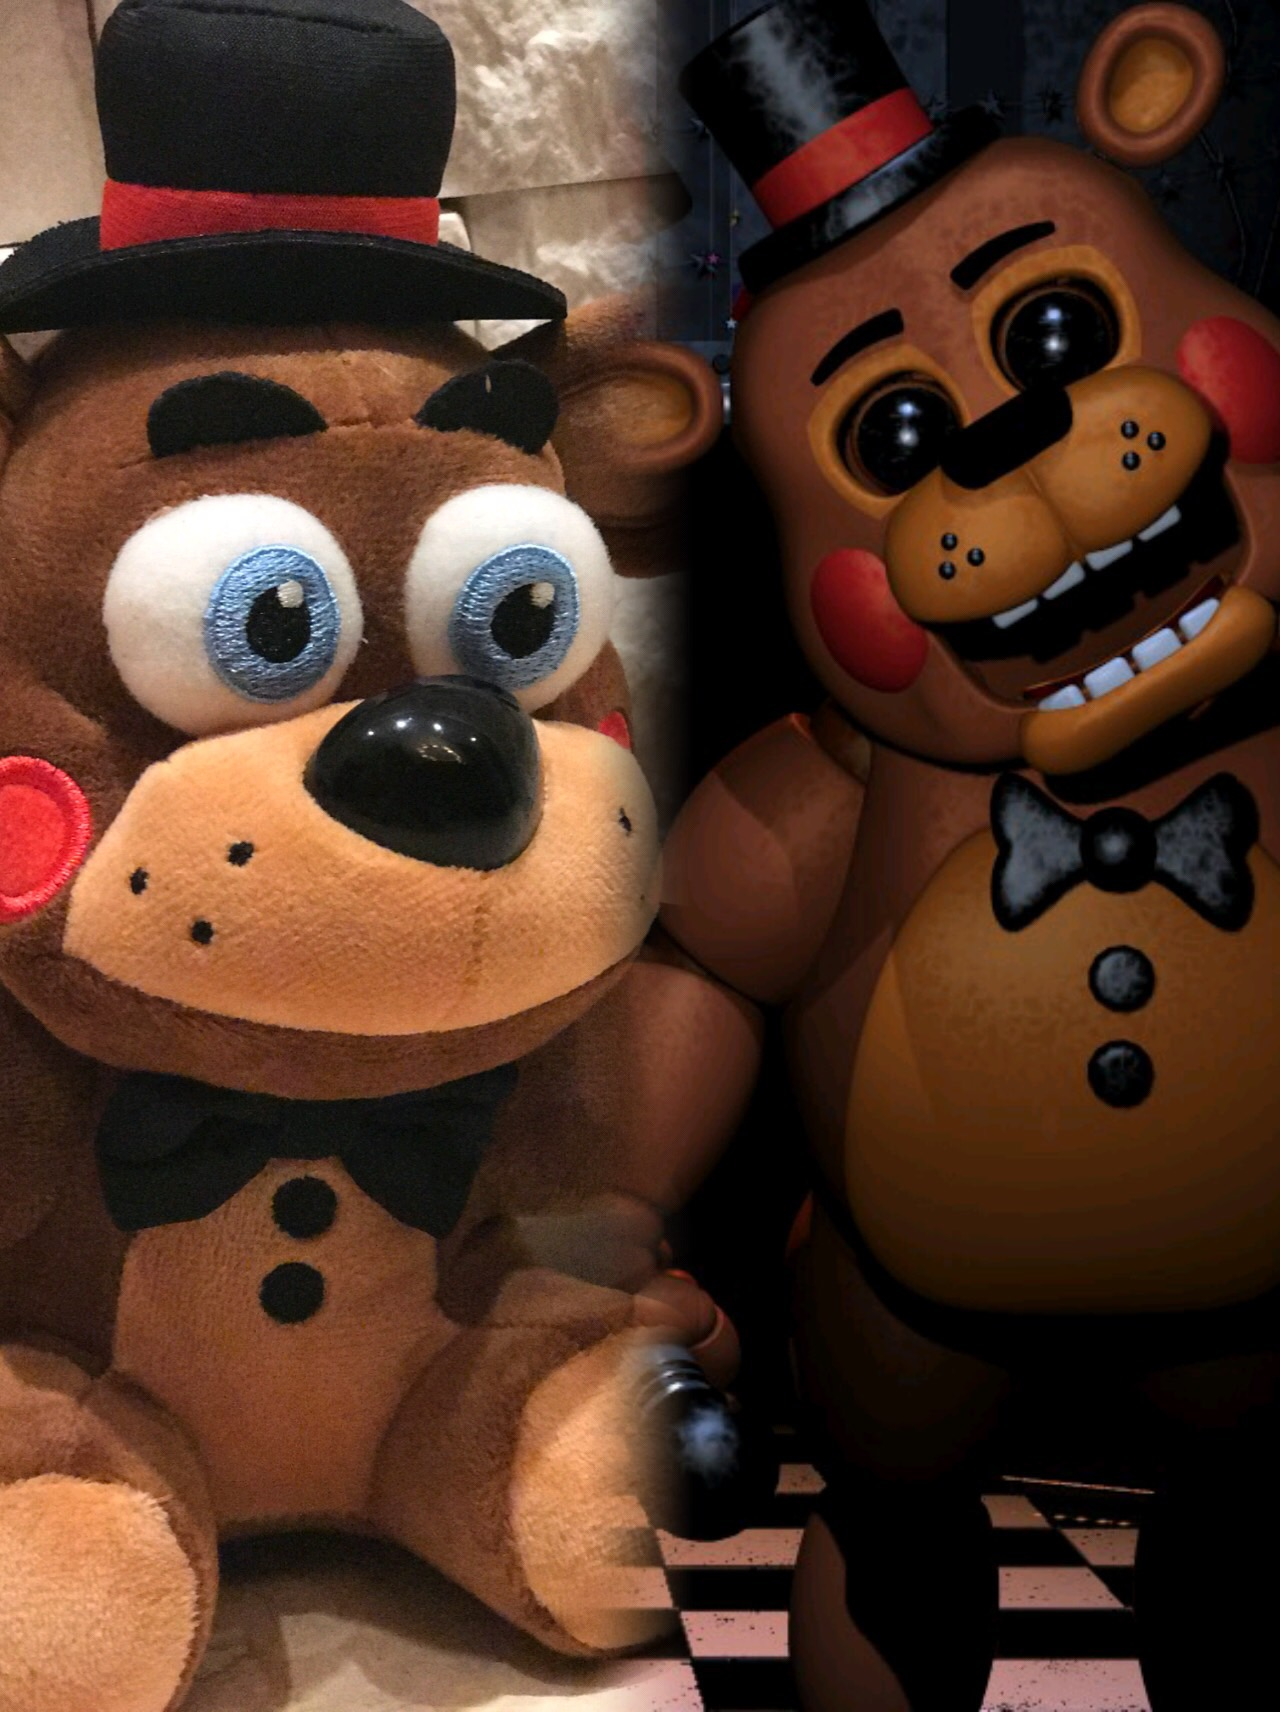 Five Nights At Freddy S Funko Plush Exclusives So Far